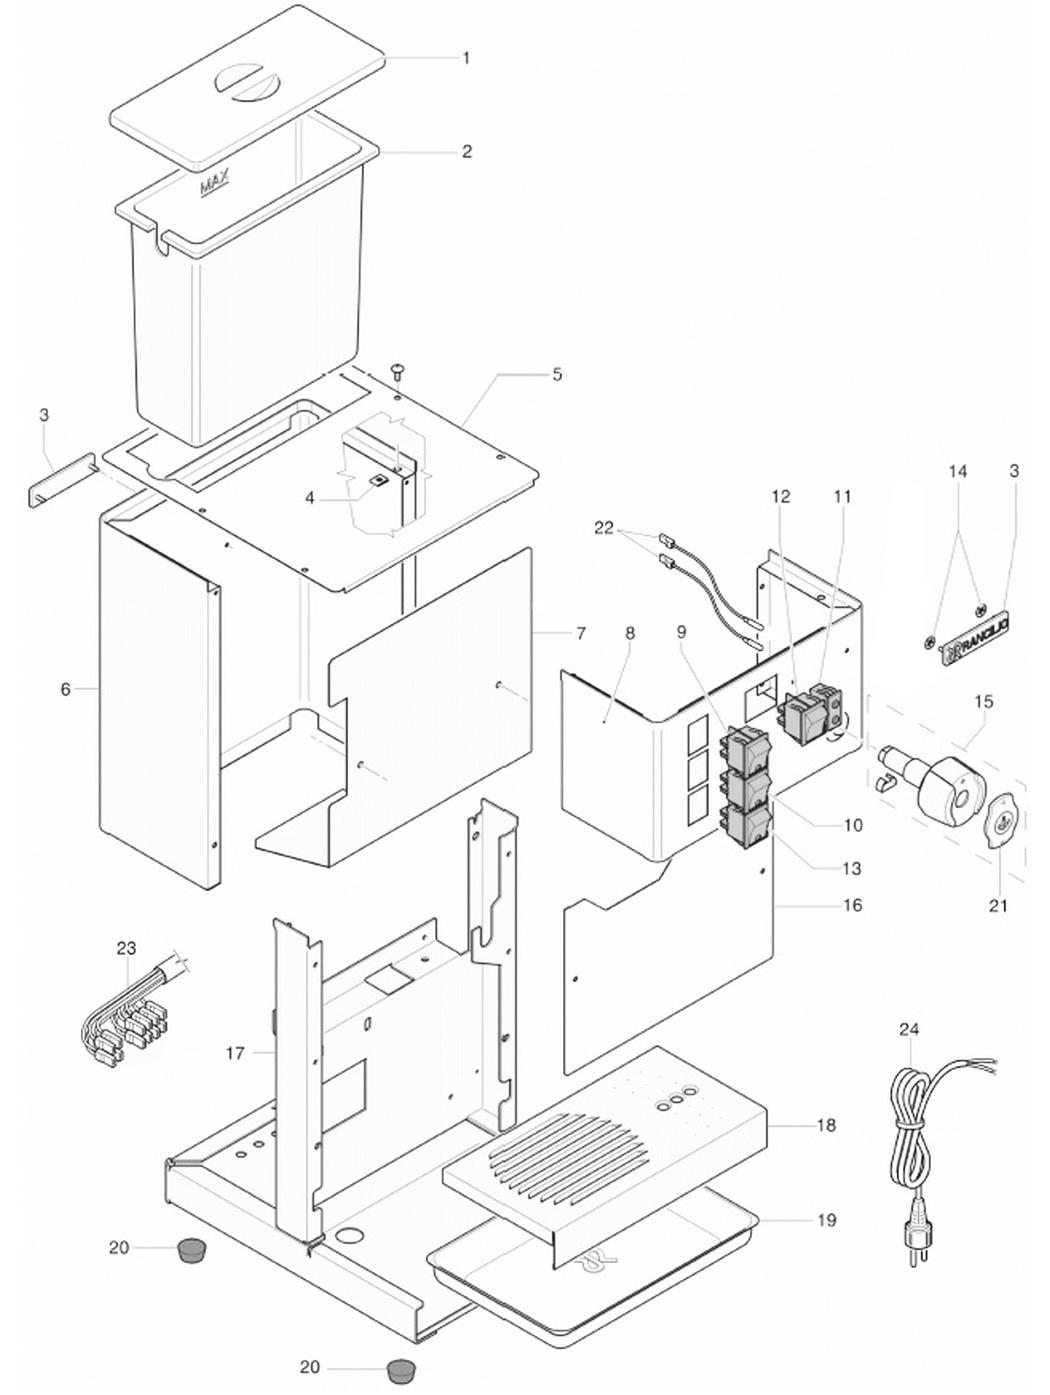 bunn coffee maker wiring schematic keurig coffee maker schematic wiring diagram